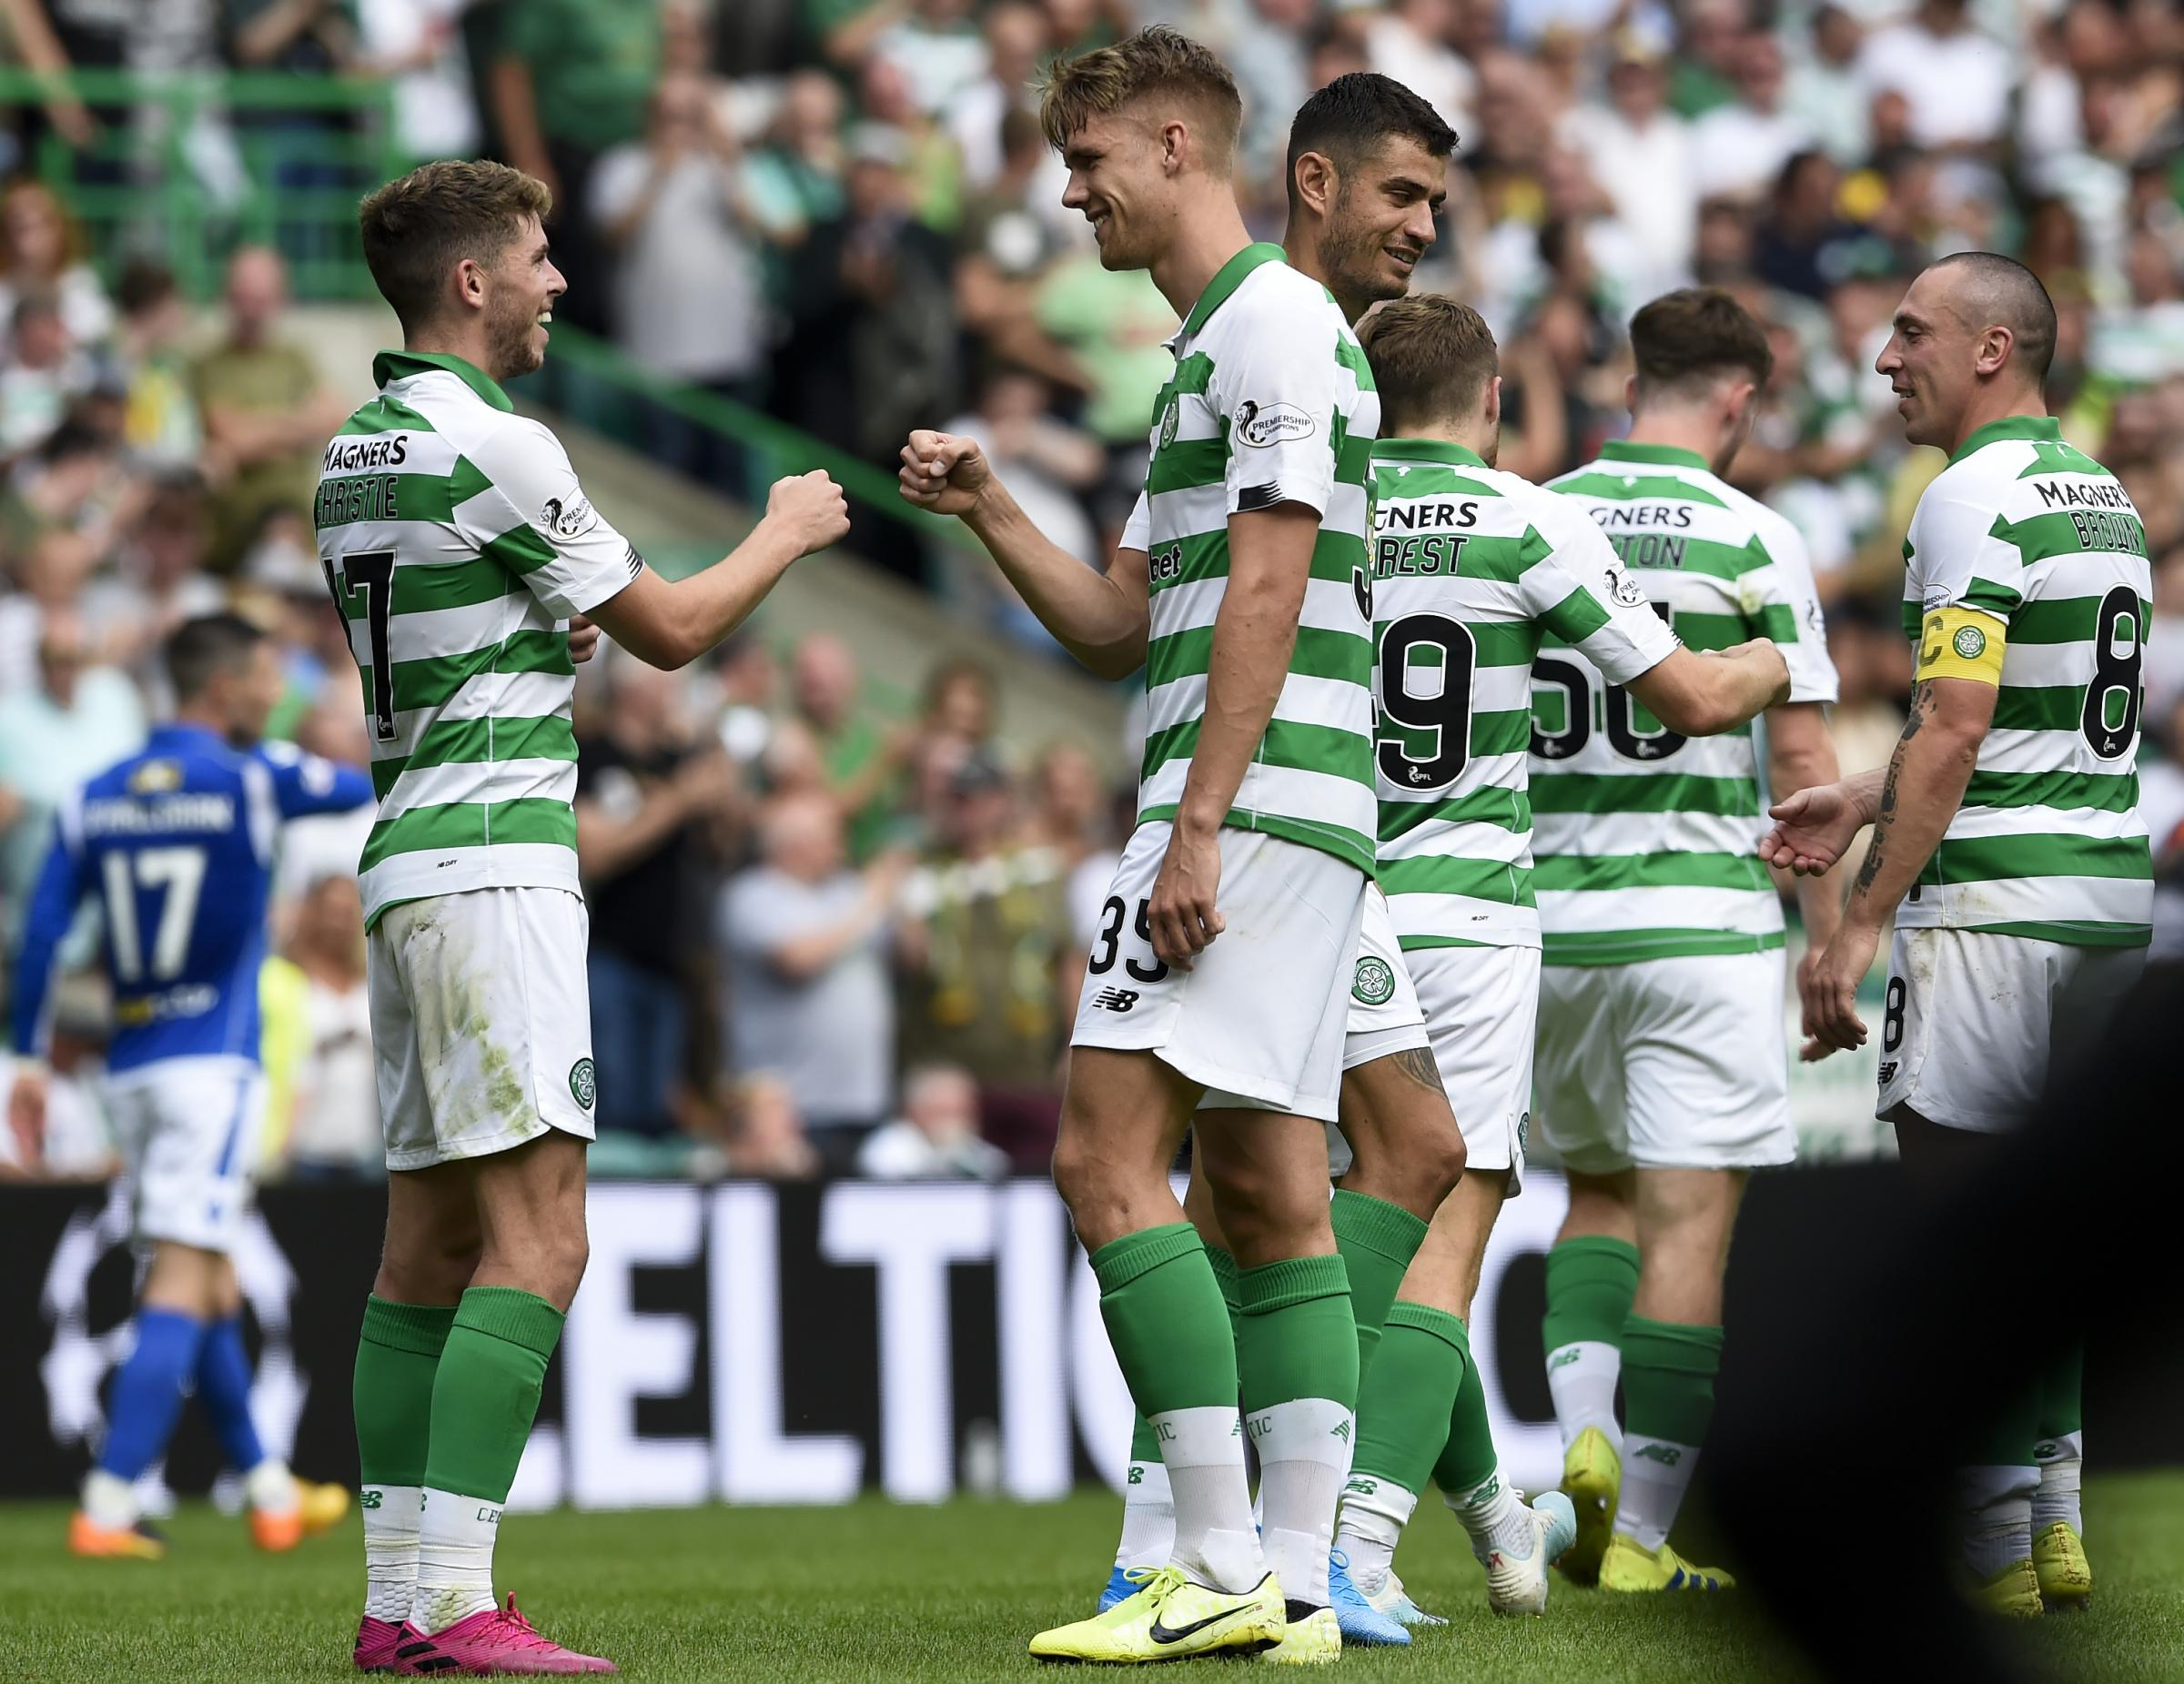 St Johnstone v Celtic | TV times, kick-off, odds and team news